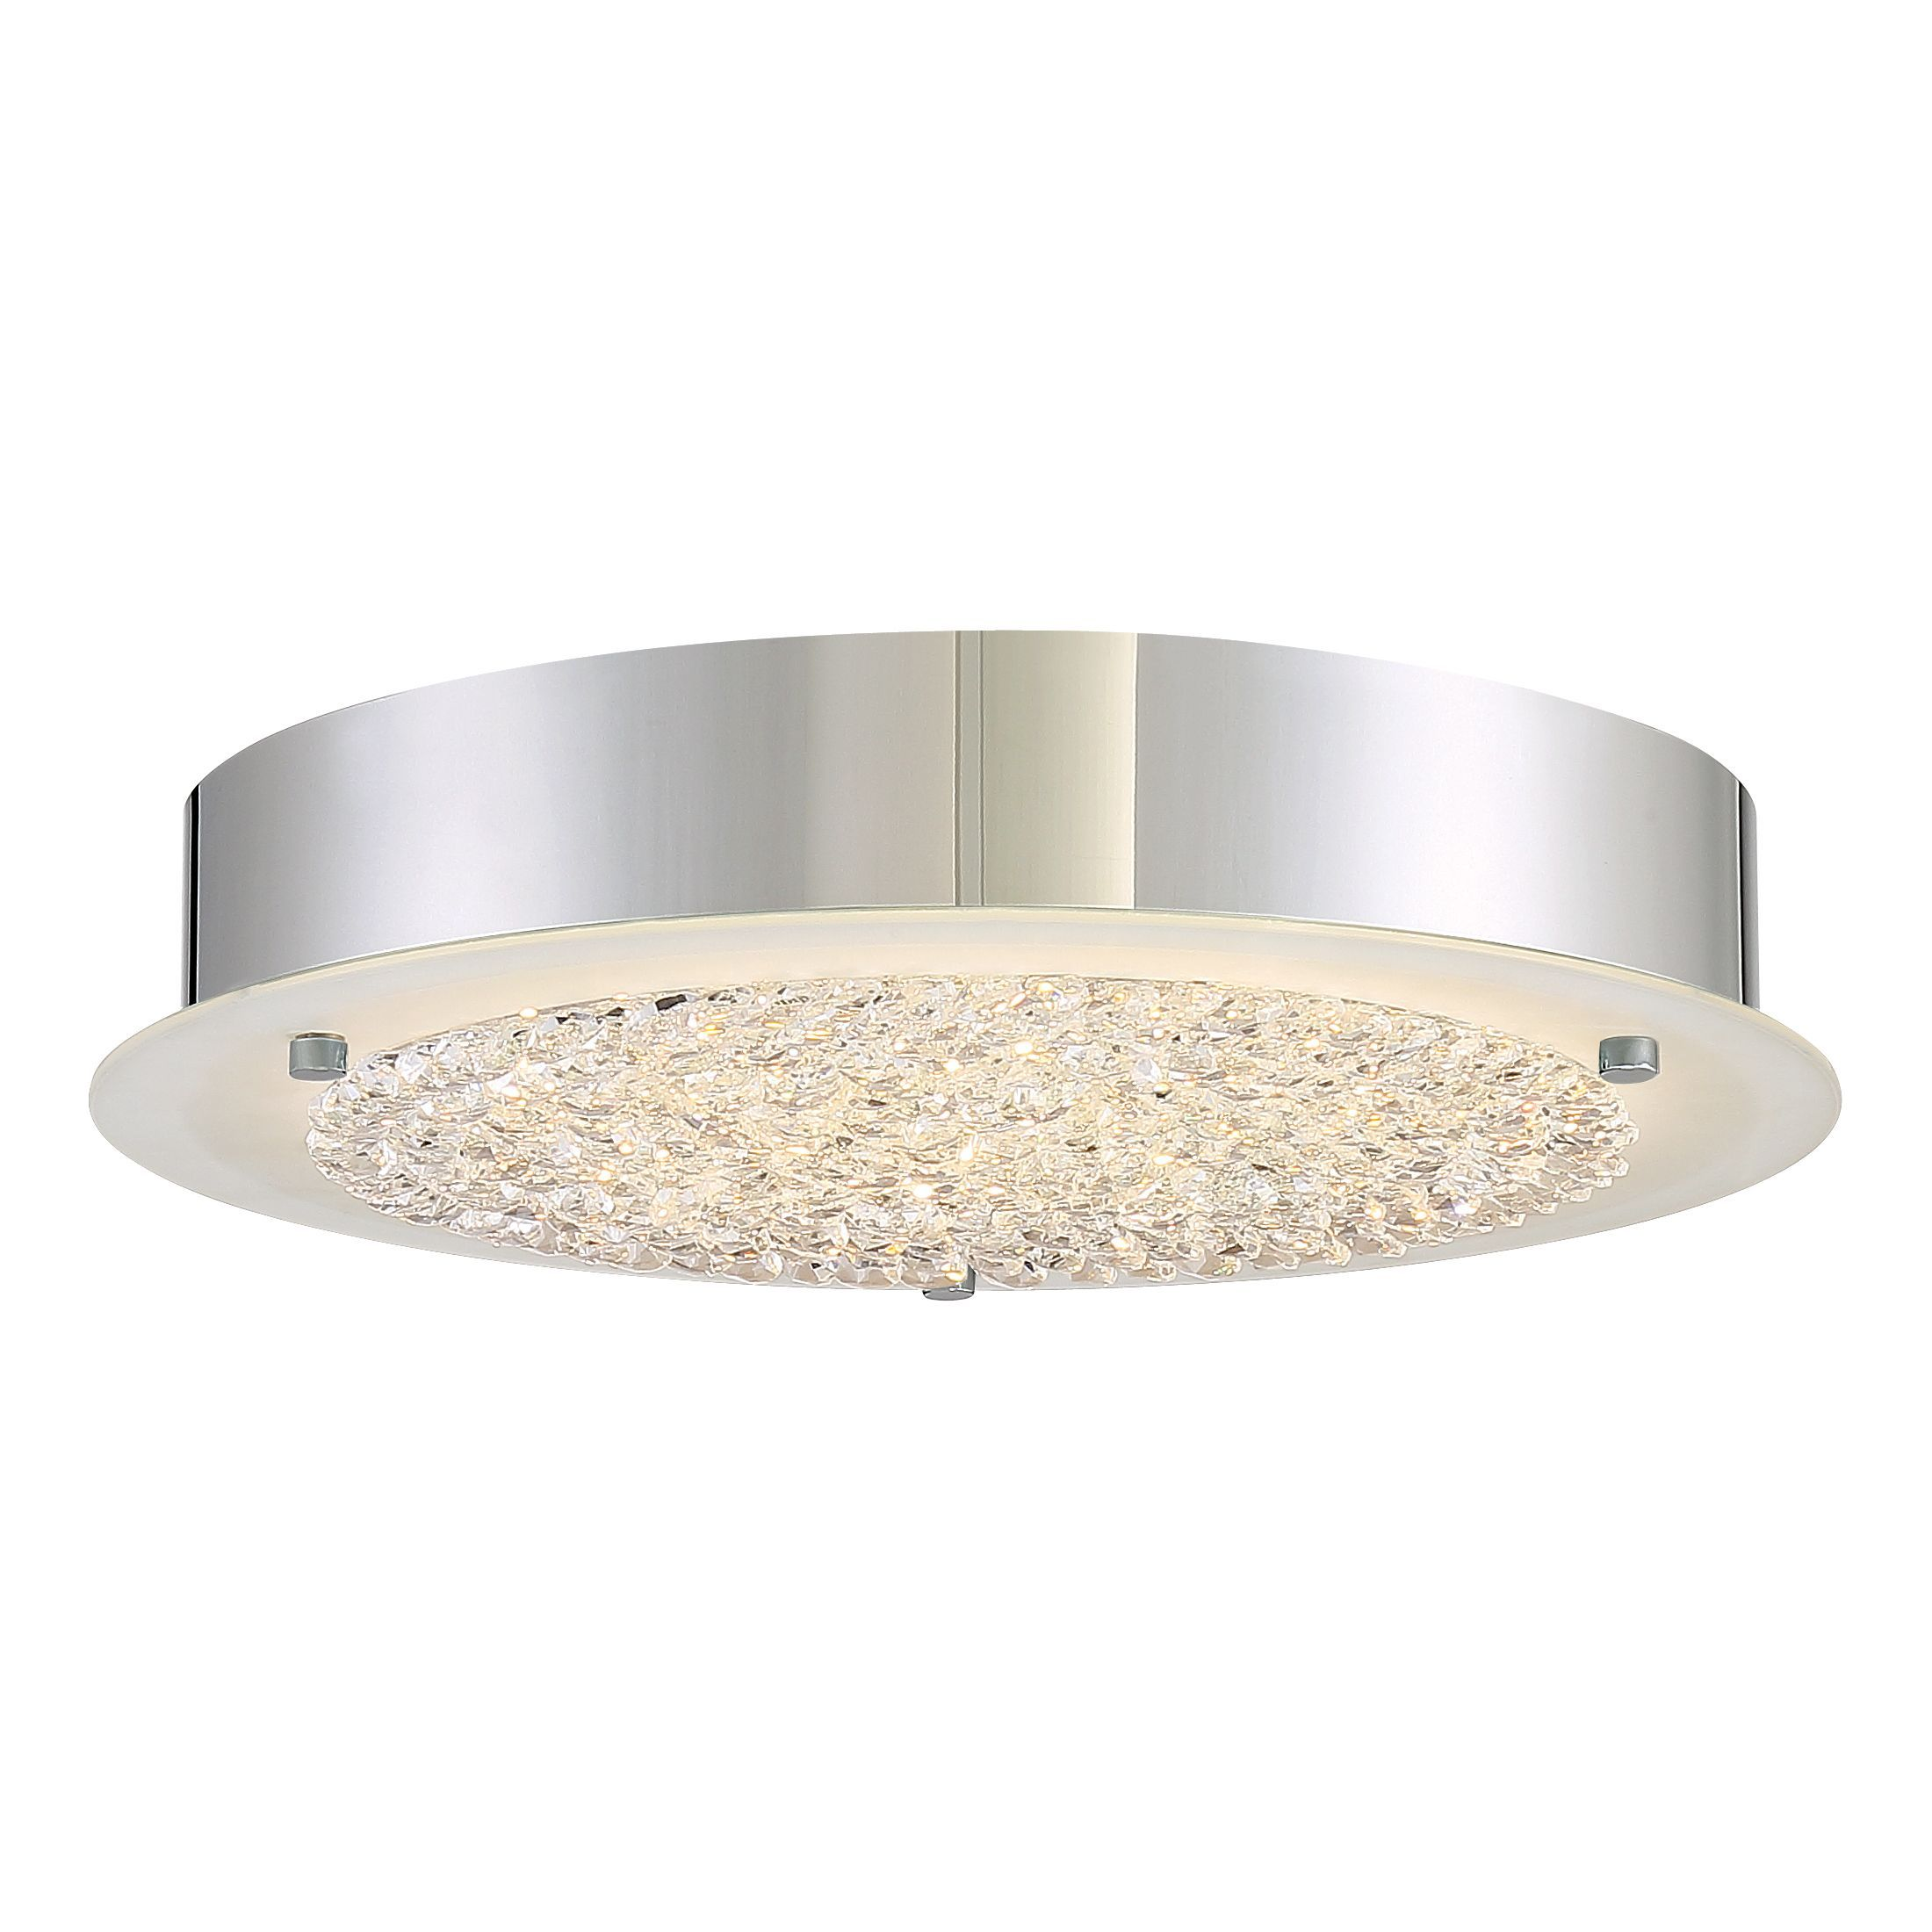 Quoizel Platinum Collection Blaze-polished Chrome Flush-mount Light ...